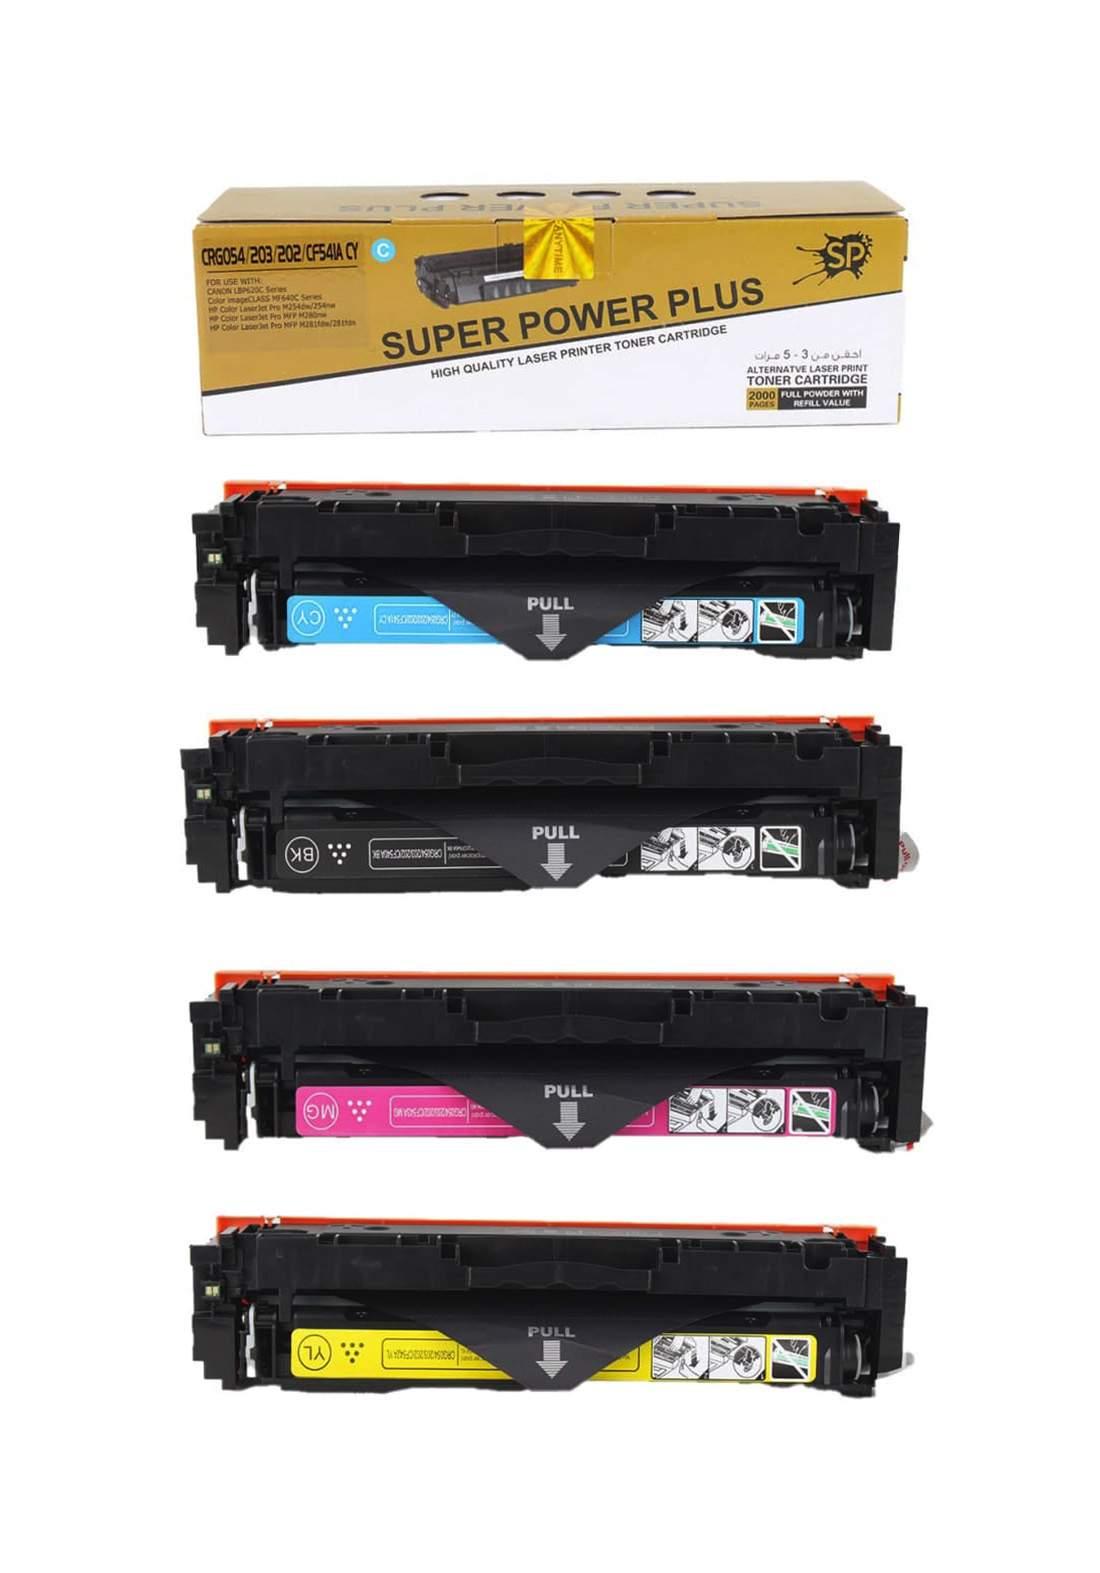 Super Power Plus 054 Laser Printer Toner Cartridge Set سيت خرطوشات حبر